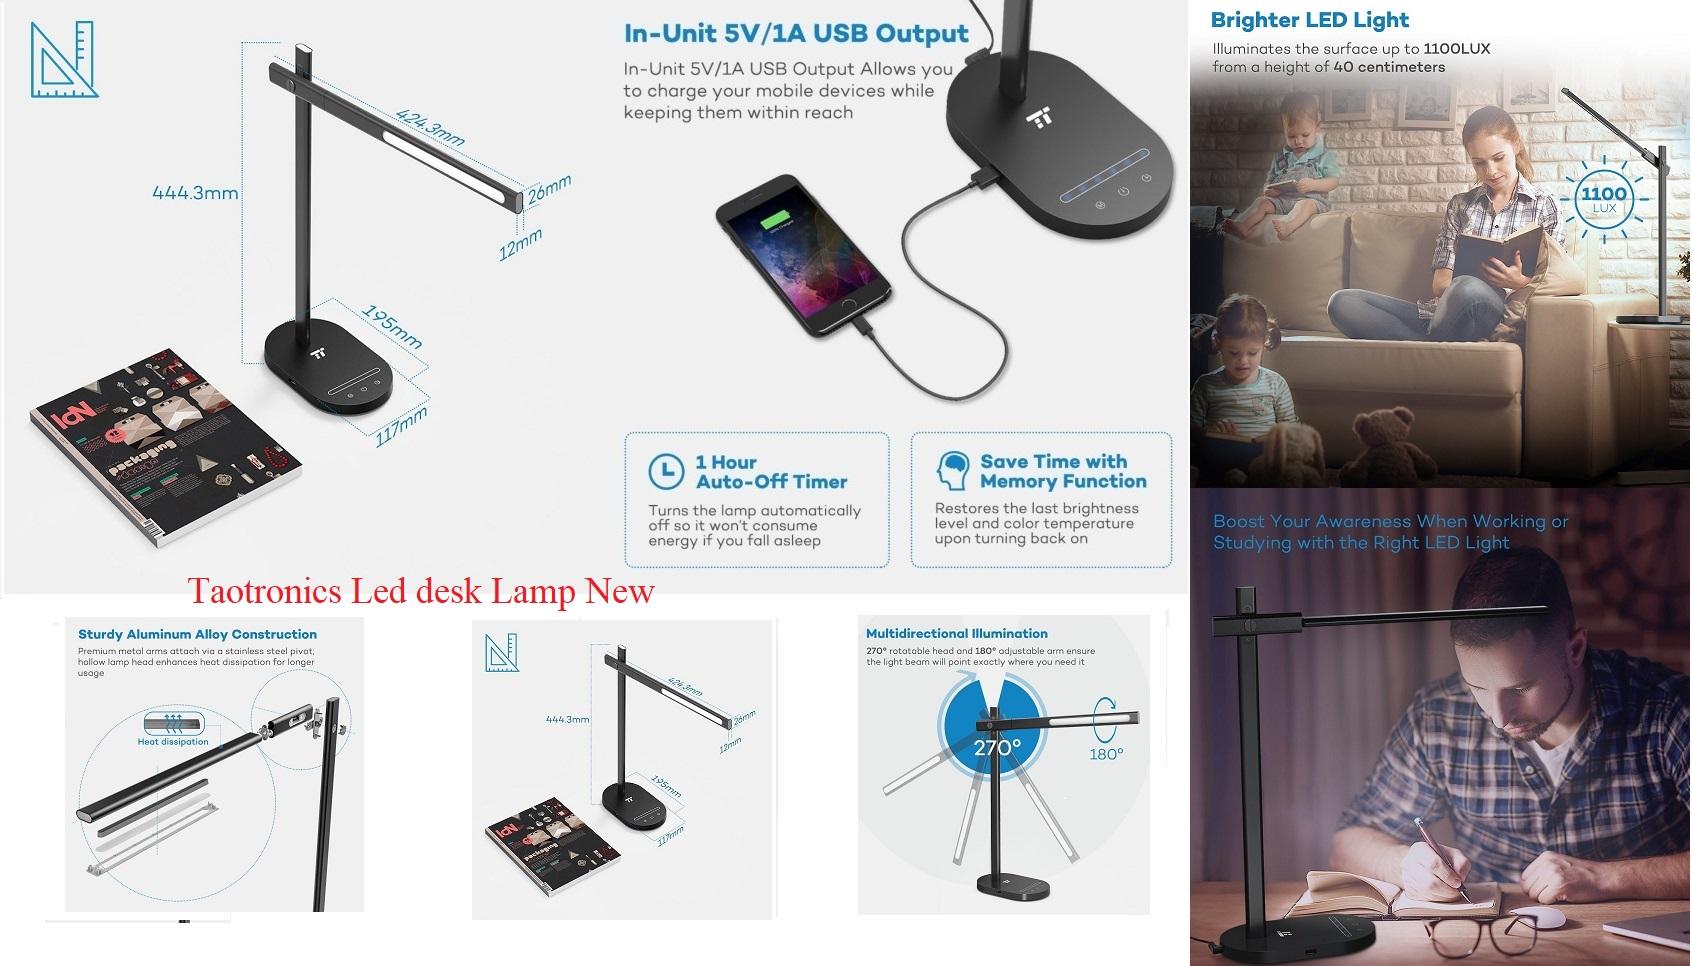 den-de-ban-taotronics-led-desk-lamp-with-premium-metal-design